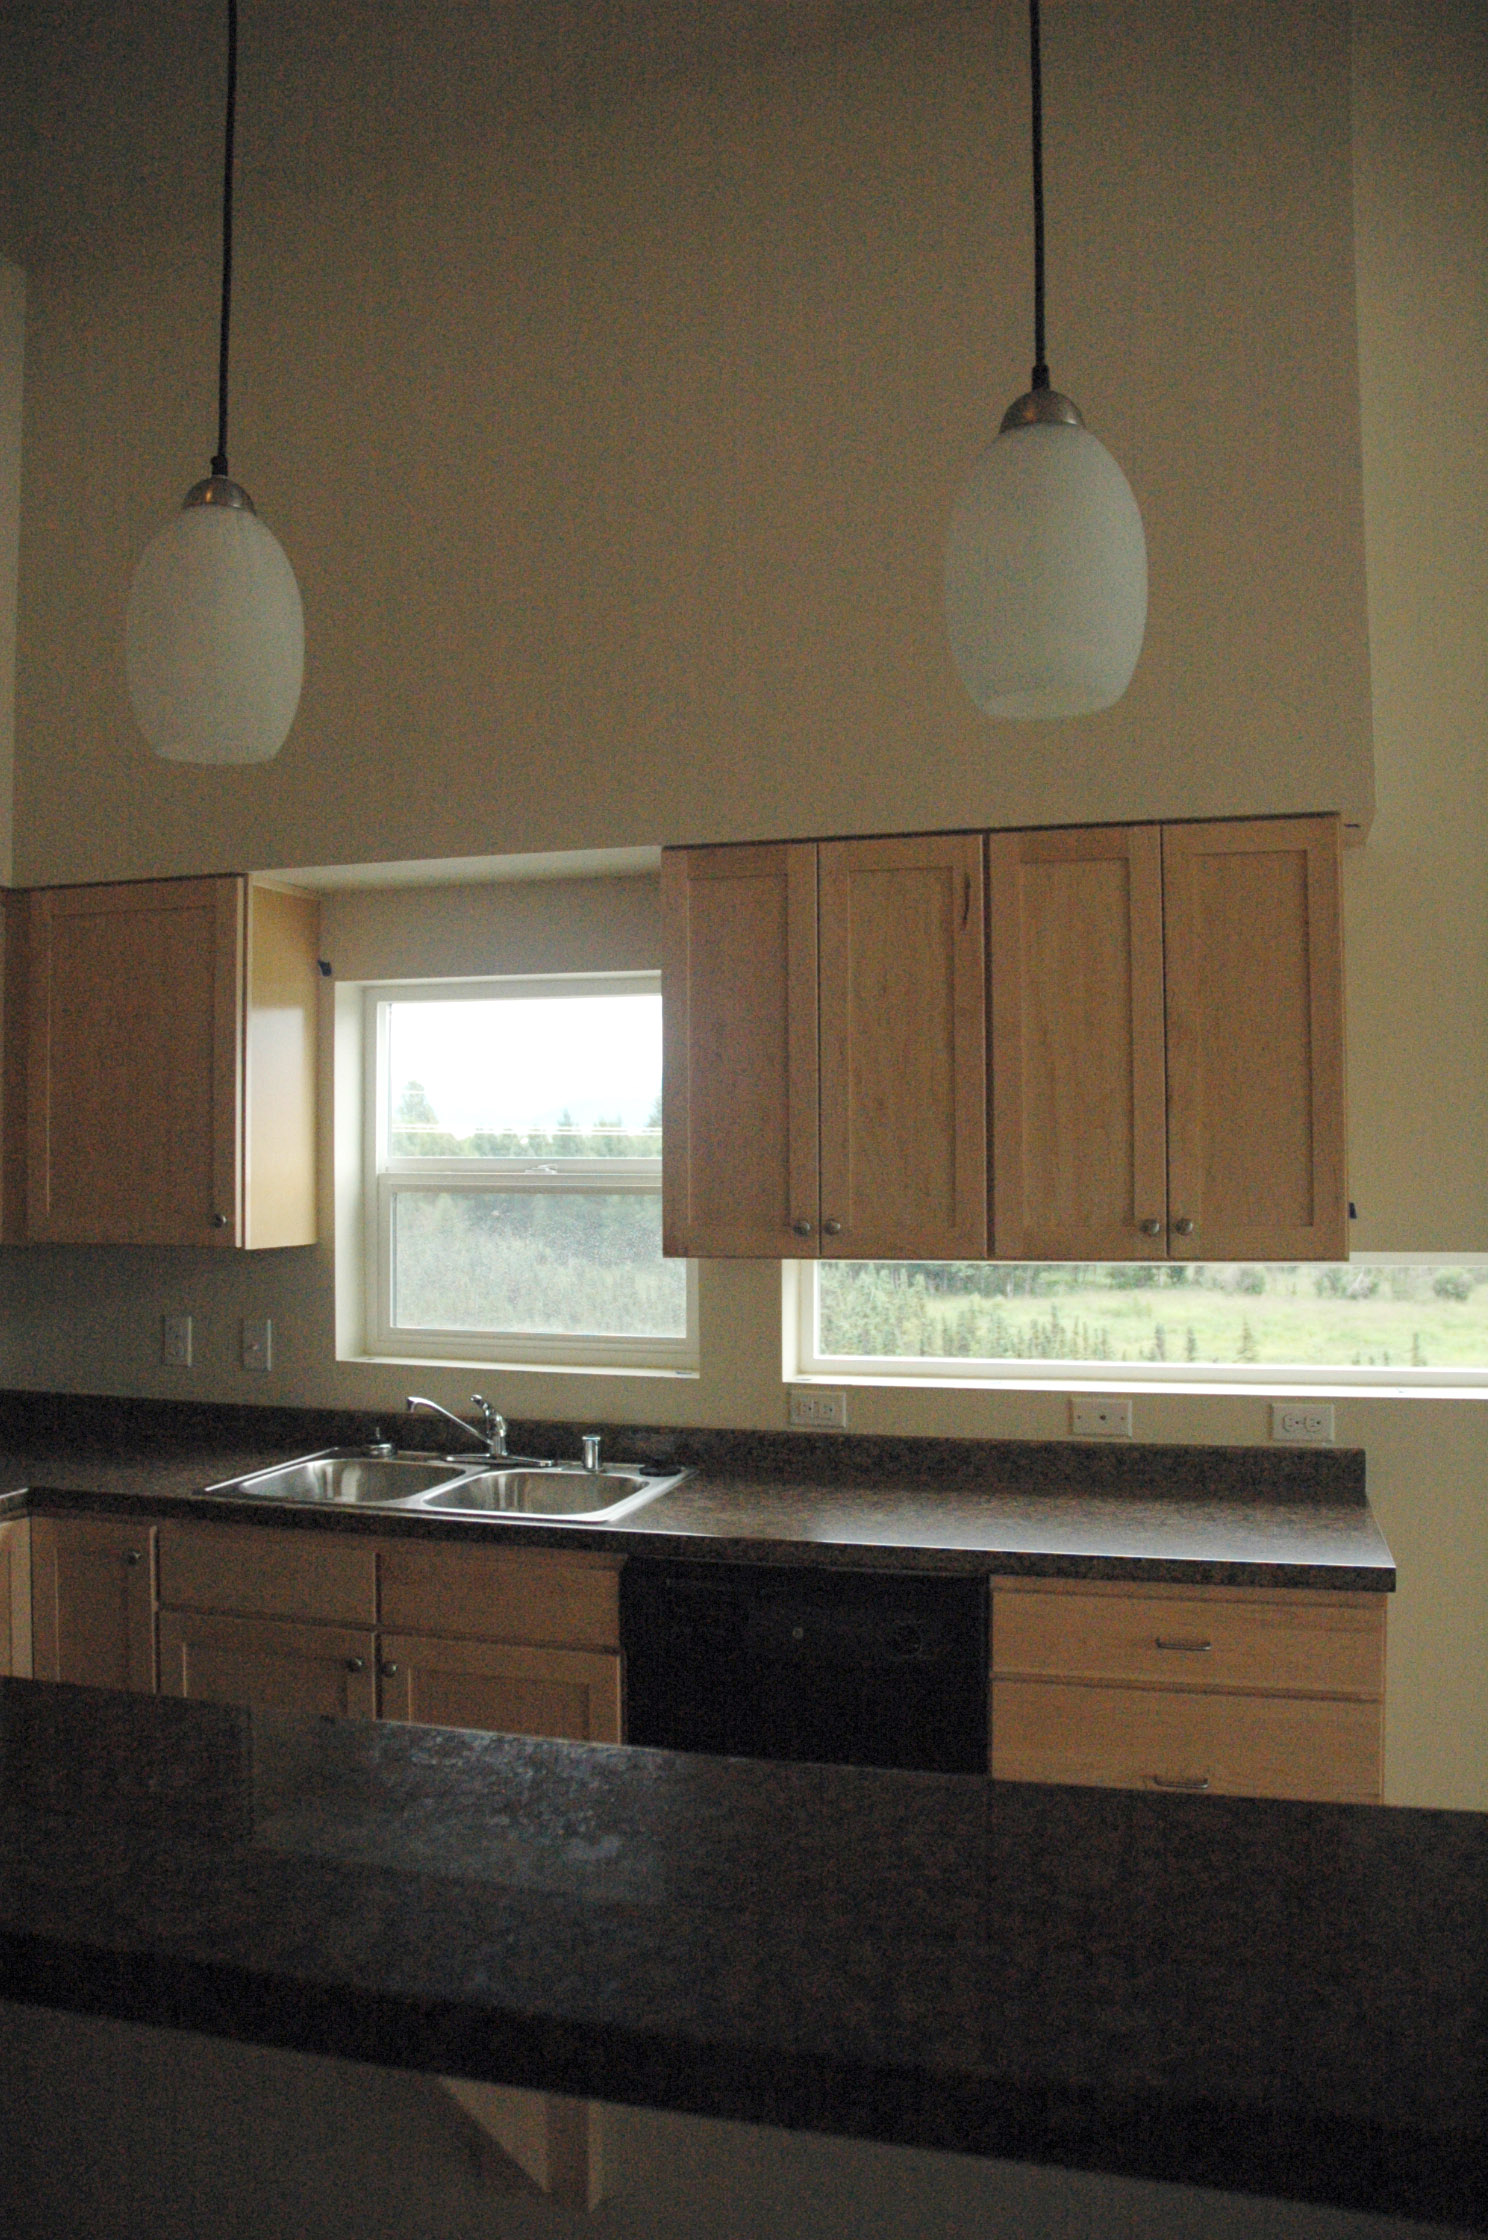 Harka Architecture_Northwood Apartments (48).jpg